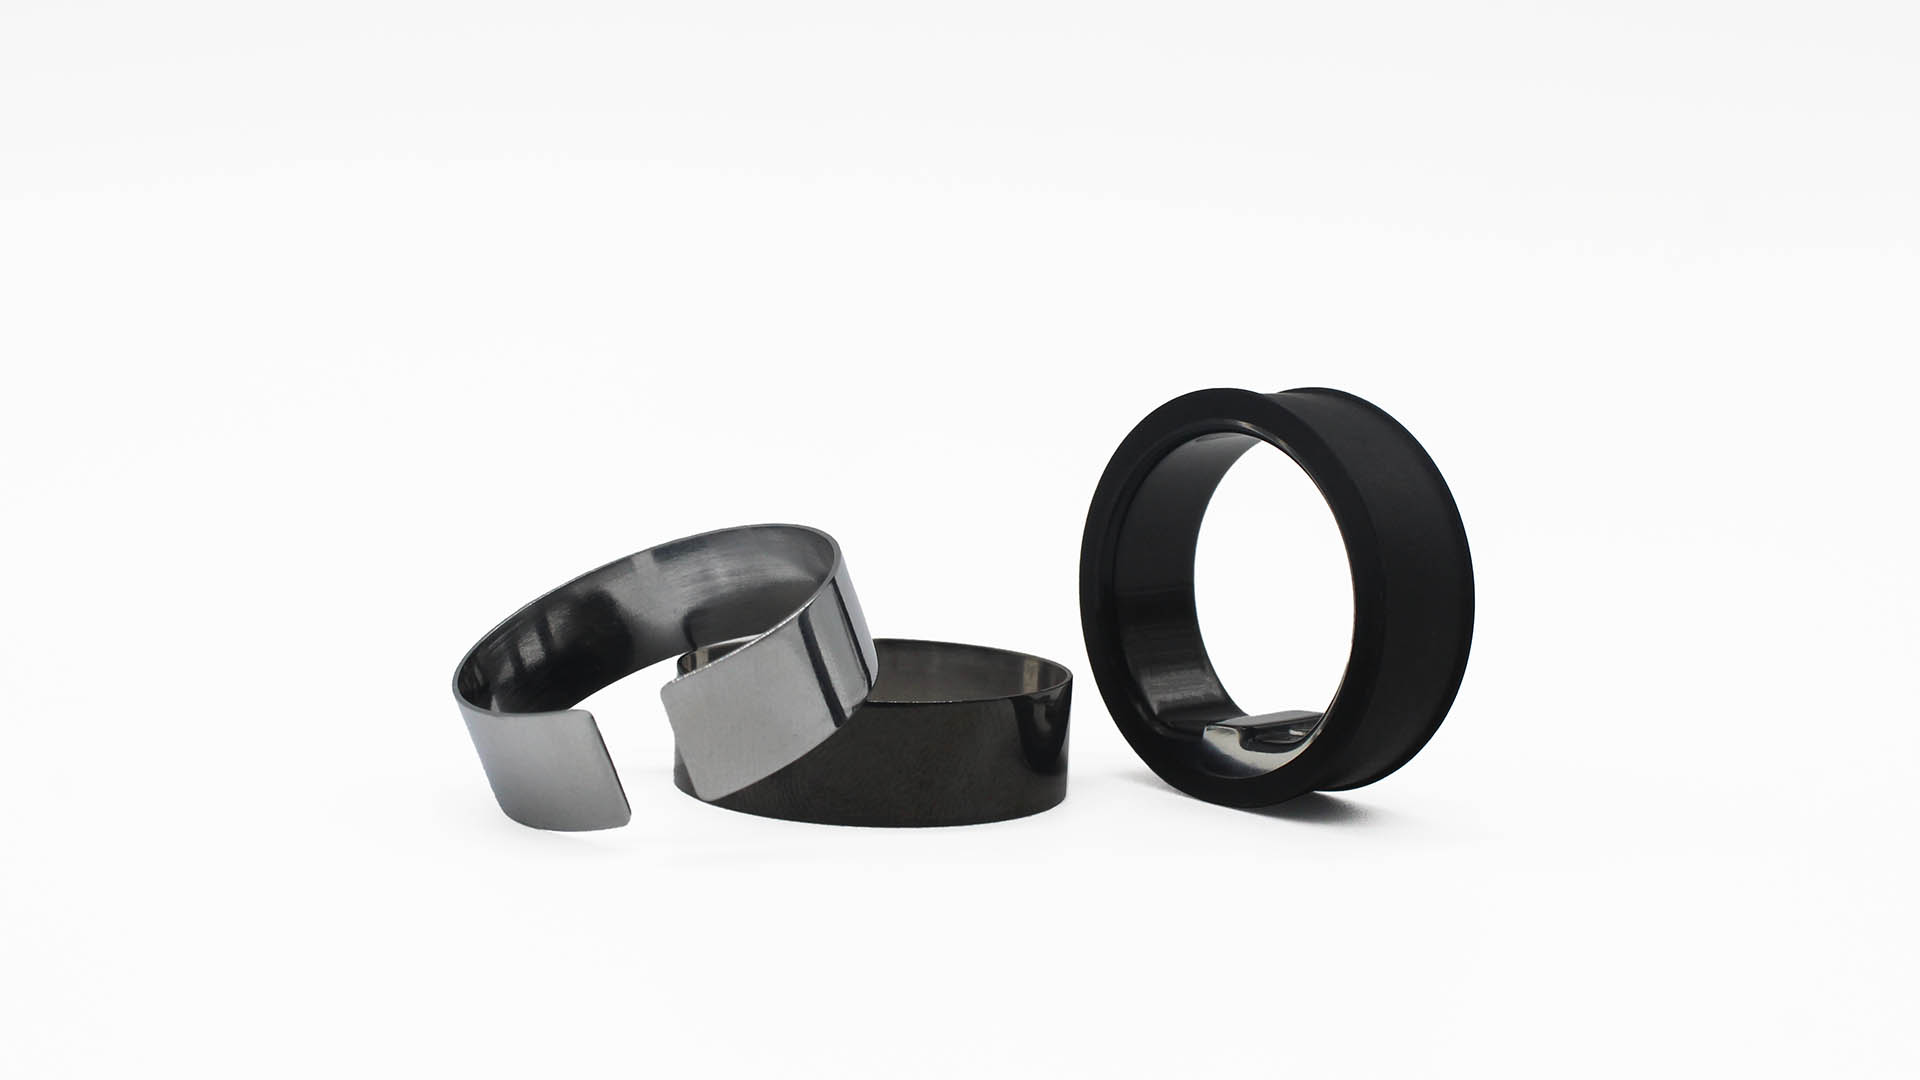 Circular rin replacement shields